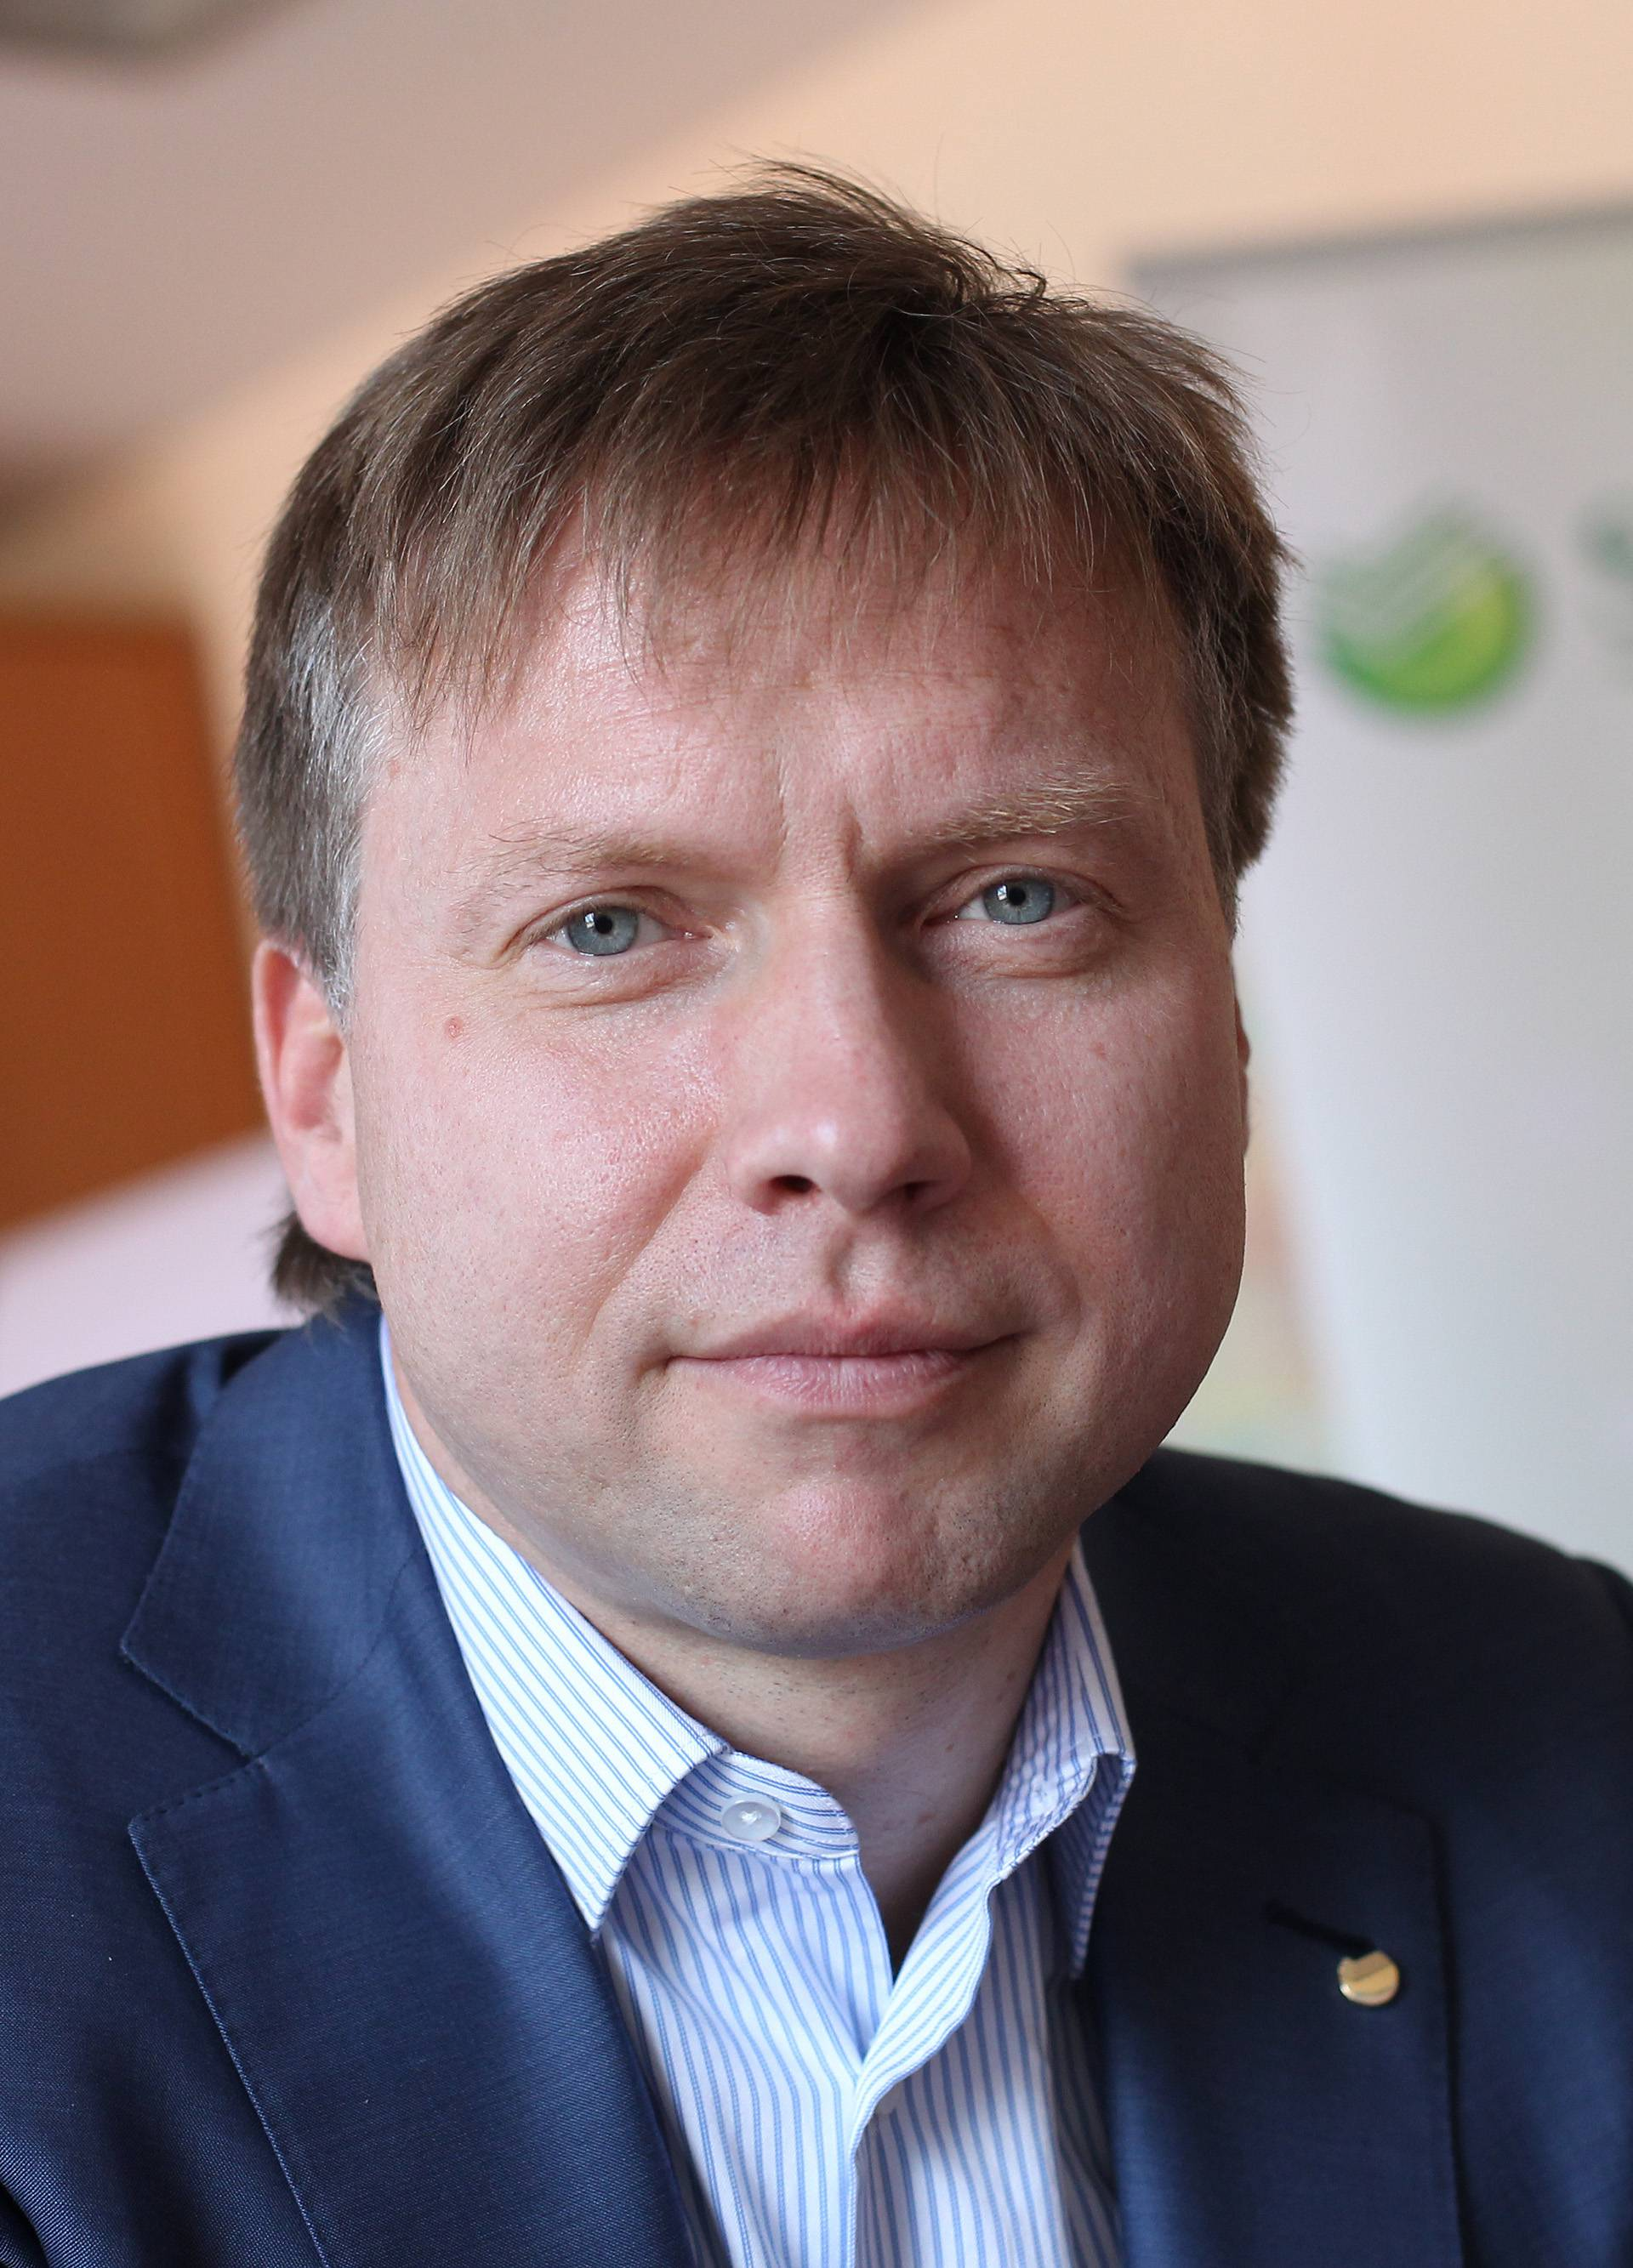 Maksim Poletaev